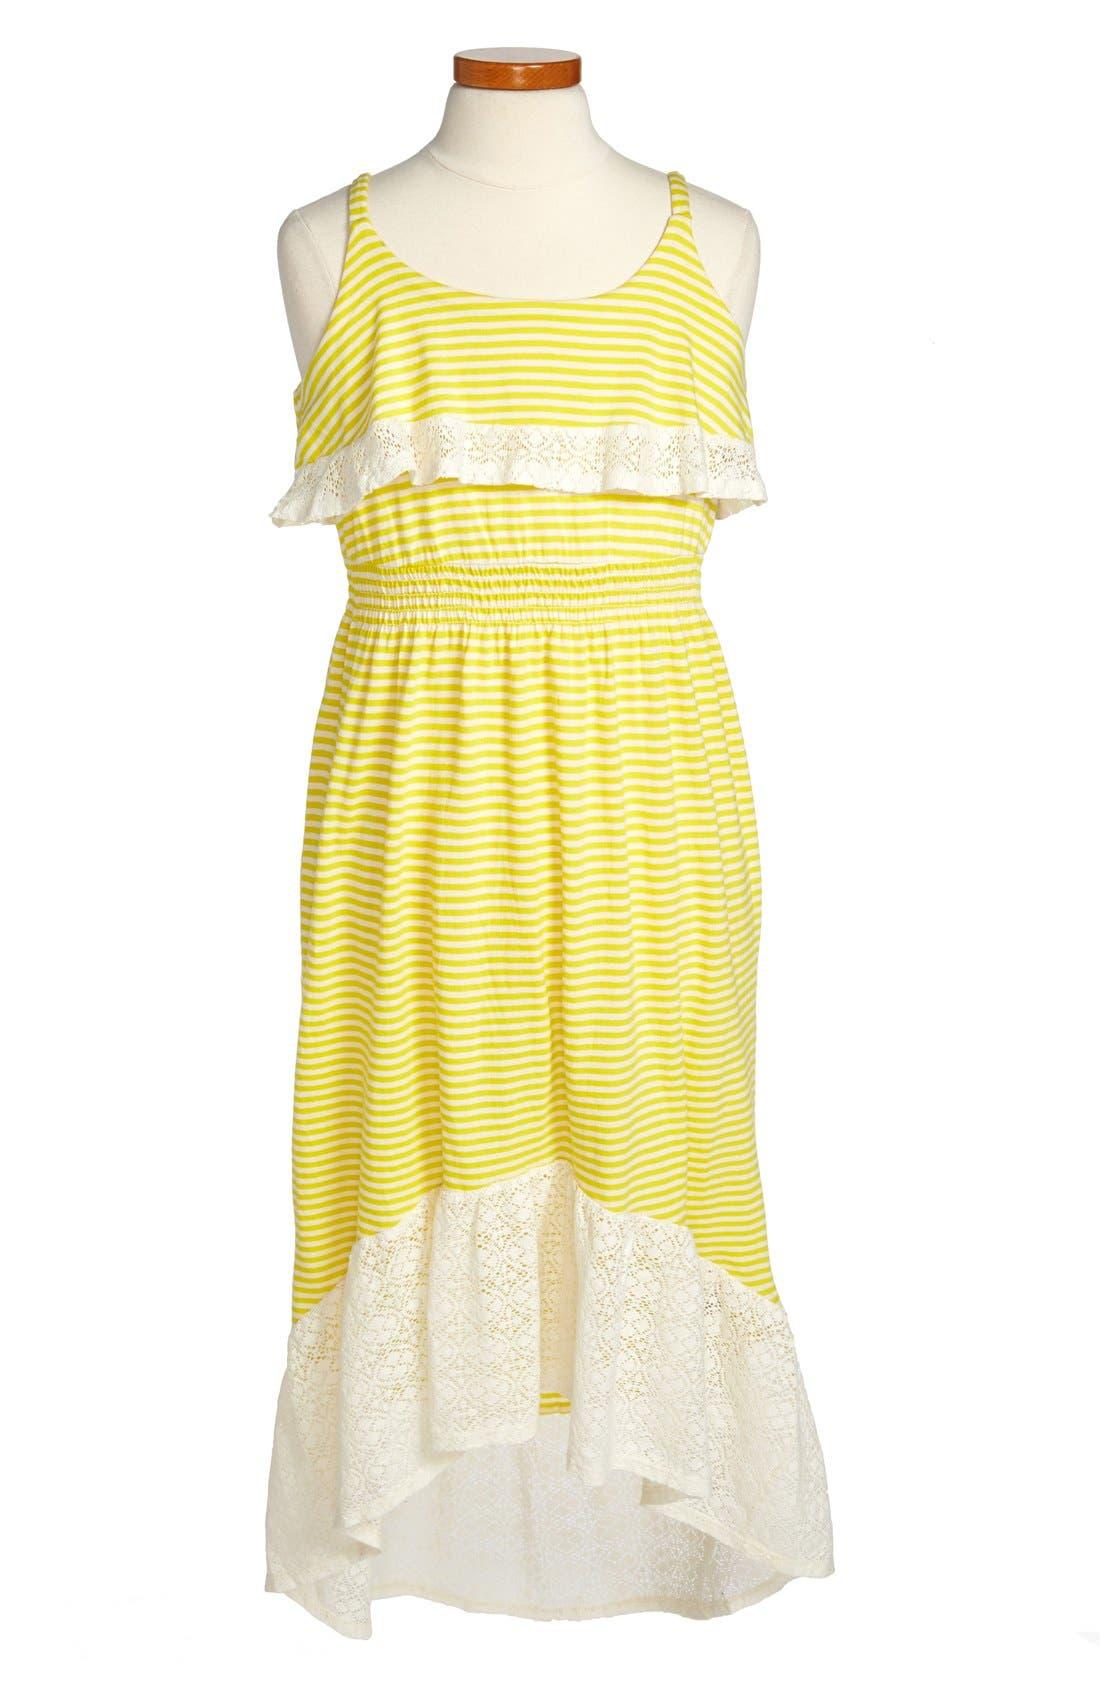 Alternate Image 1 Selected - Roxy 'Kittridge' Knit Dress (Big Girls)